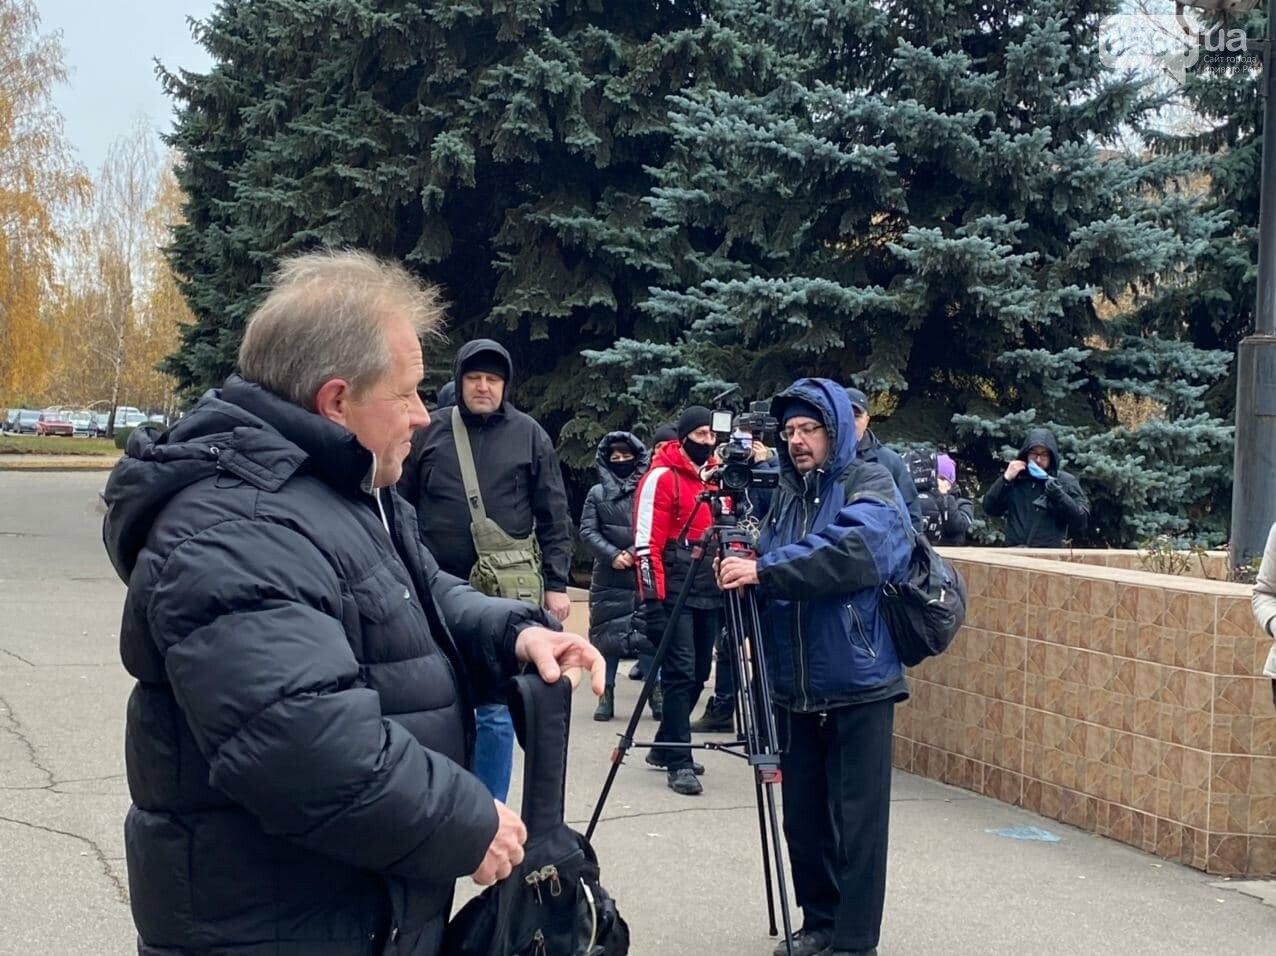 Представители малого бизнеса продолжили протест возле мэрии Кривого Рога, - ФОТО, ВИДЕО, фото-14